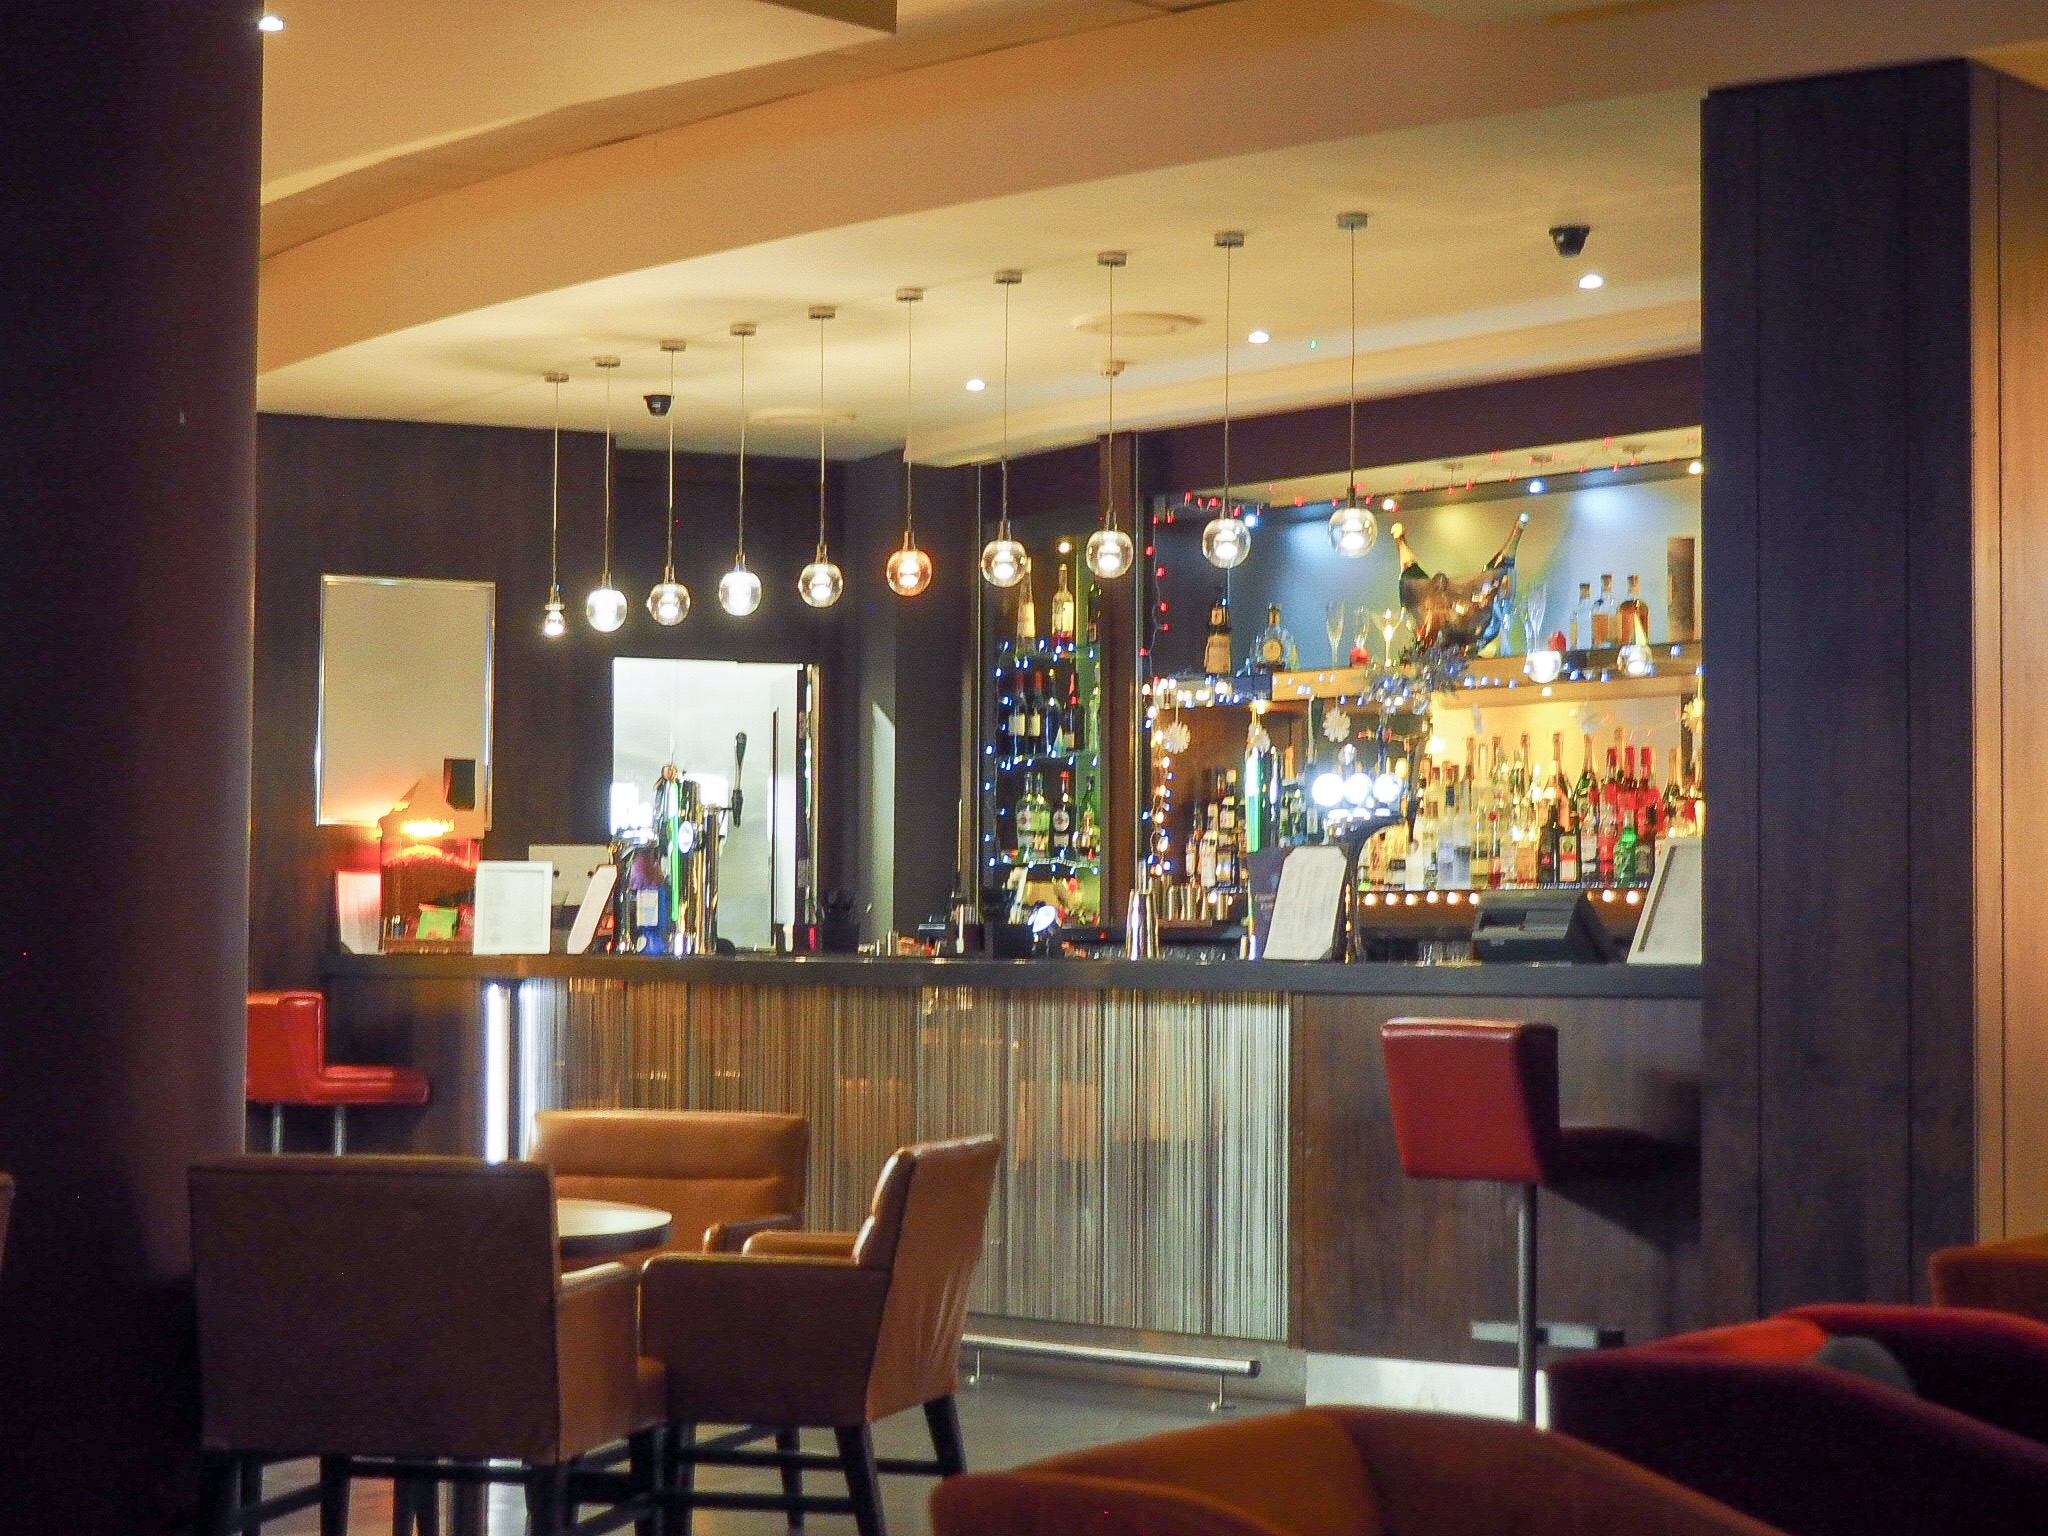 Crowne Plaza Resort Colchester bars